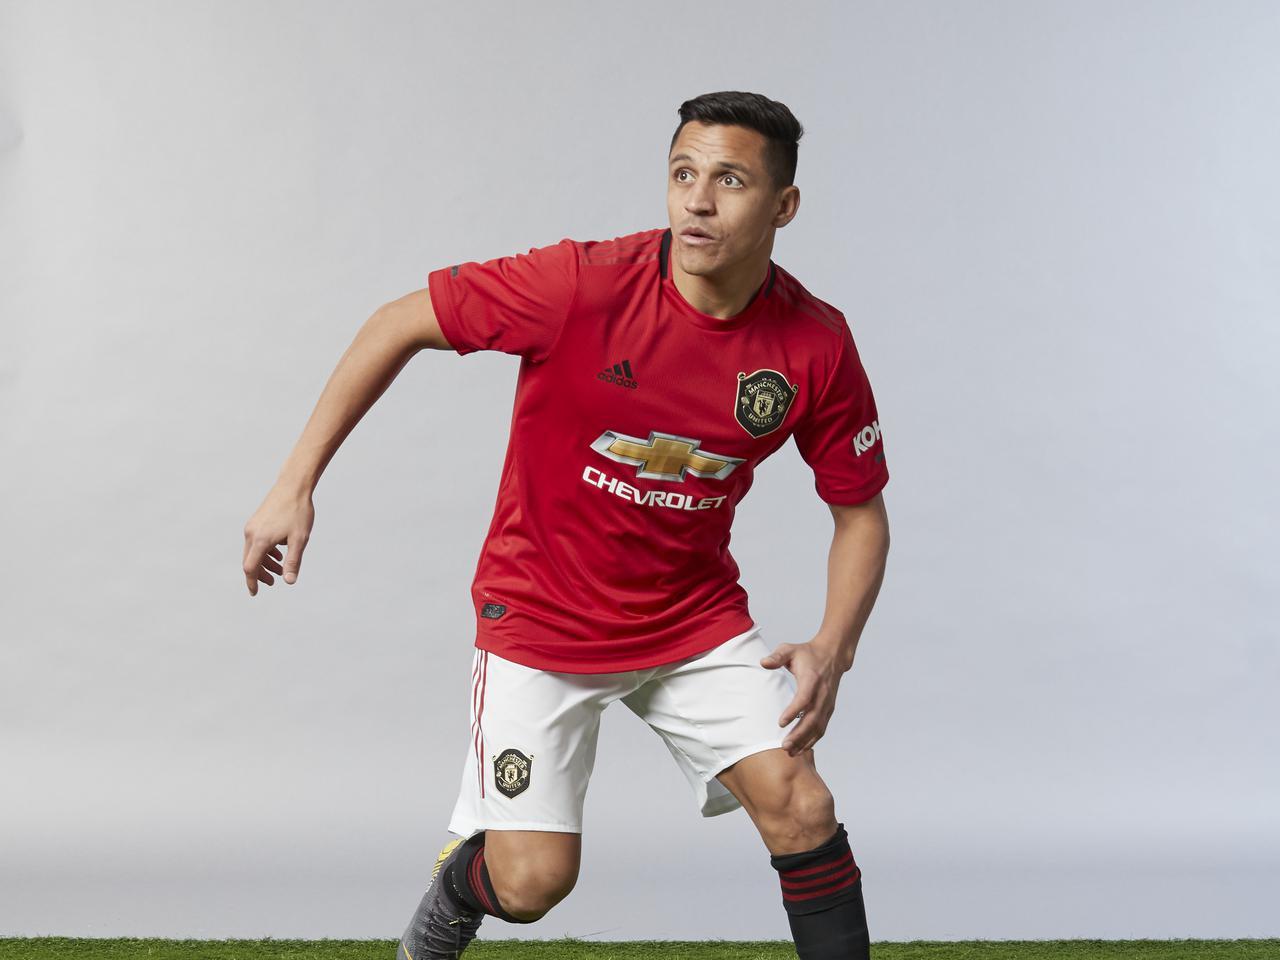 Solskjaer injury update on Man Utd forward Alexis Sanchez ...